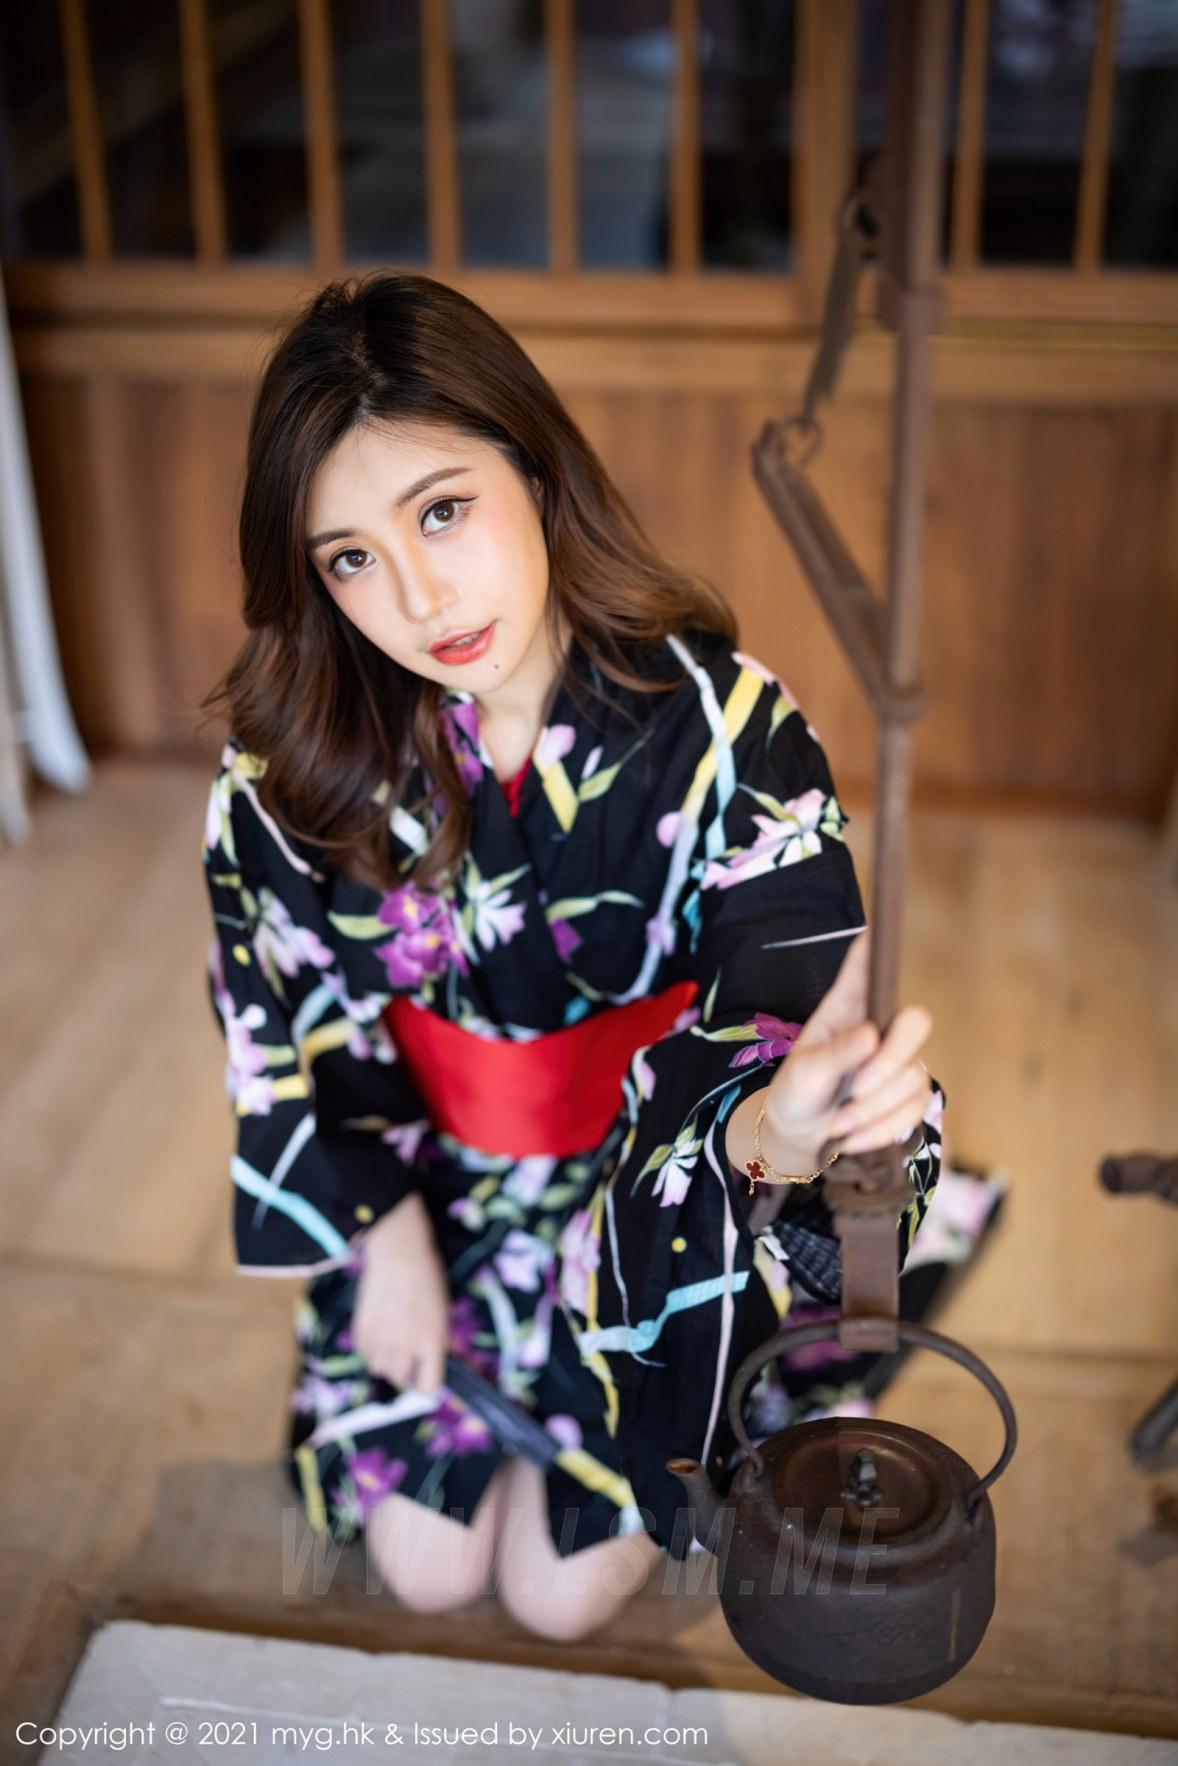 MyGirl 美媛馆 Vol.594 红绳缠绕和服 绮里嘉Carina 长三角旅拍 - 4